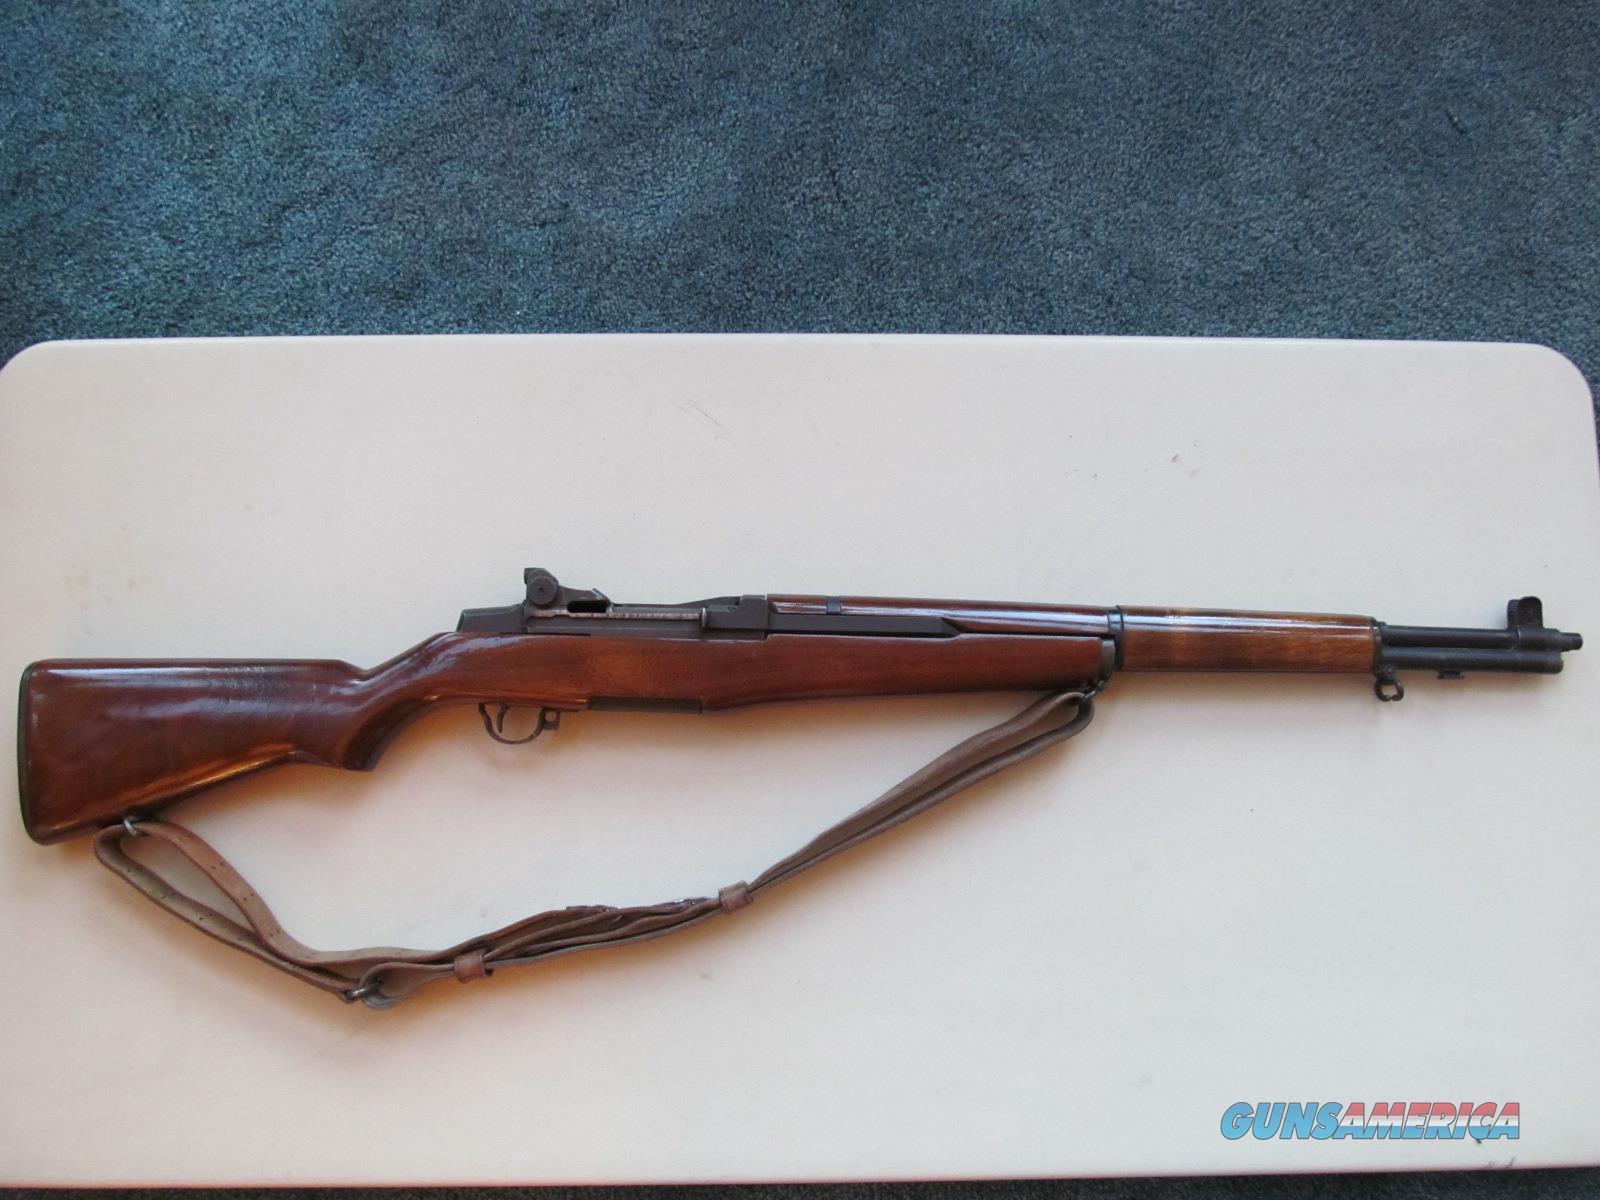 Springfield M1 Garand National Match (NM) Navy Trophy Rifle 7.62X51 (.308) *RARE!!!* (m14, m1a, carbine, 1903, Remington, Winchester, H&R, US, .30 cal)  Guns > Rifles > Springfield Armory Rifles > M1 Garand